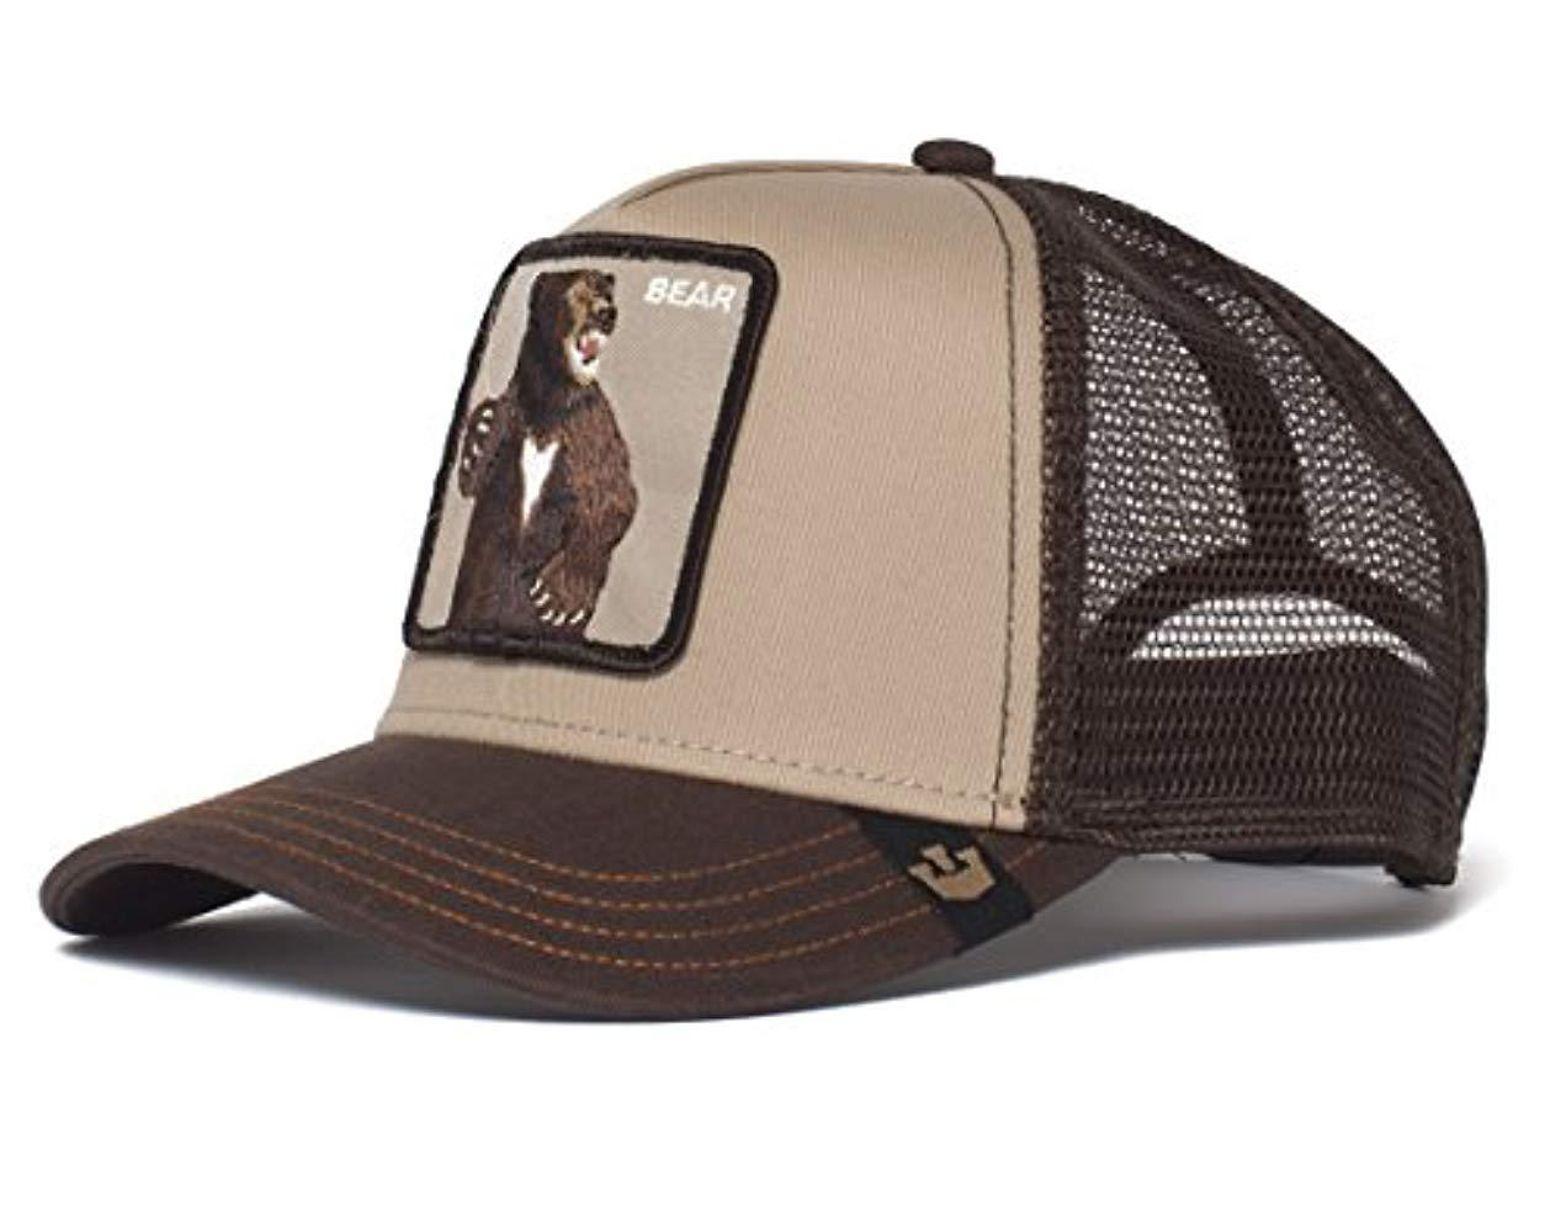 a6dccbf95c264 Goorin Bros Animal Farm Snap Back Trucker Hat